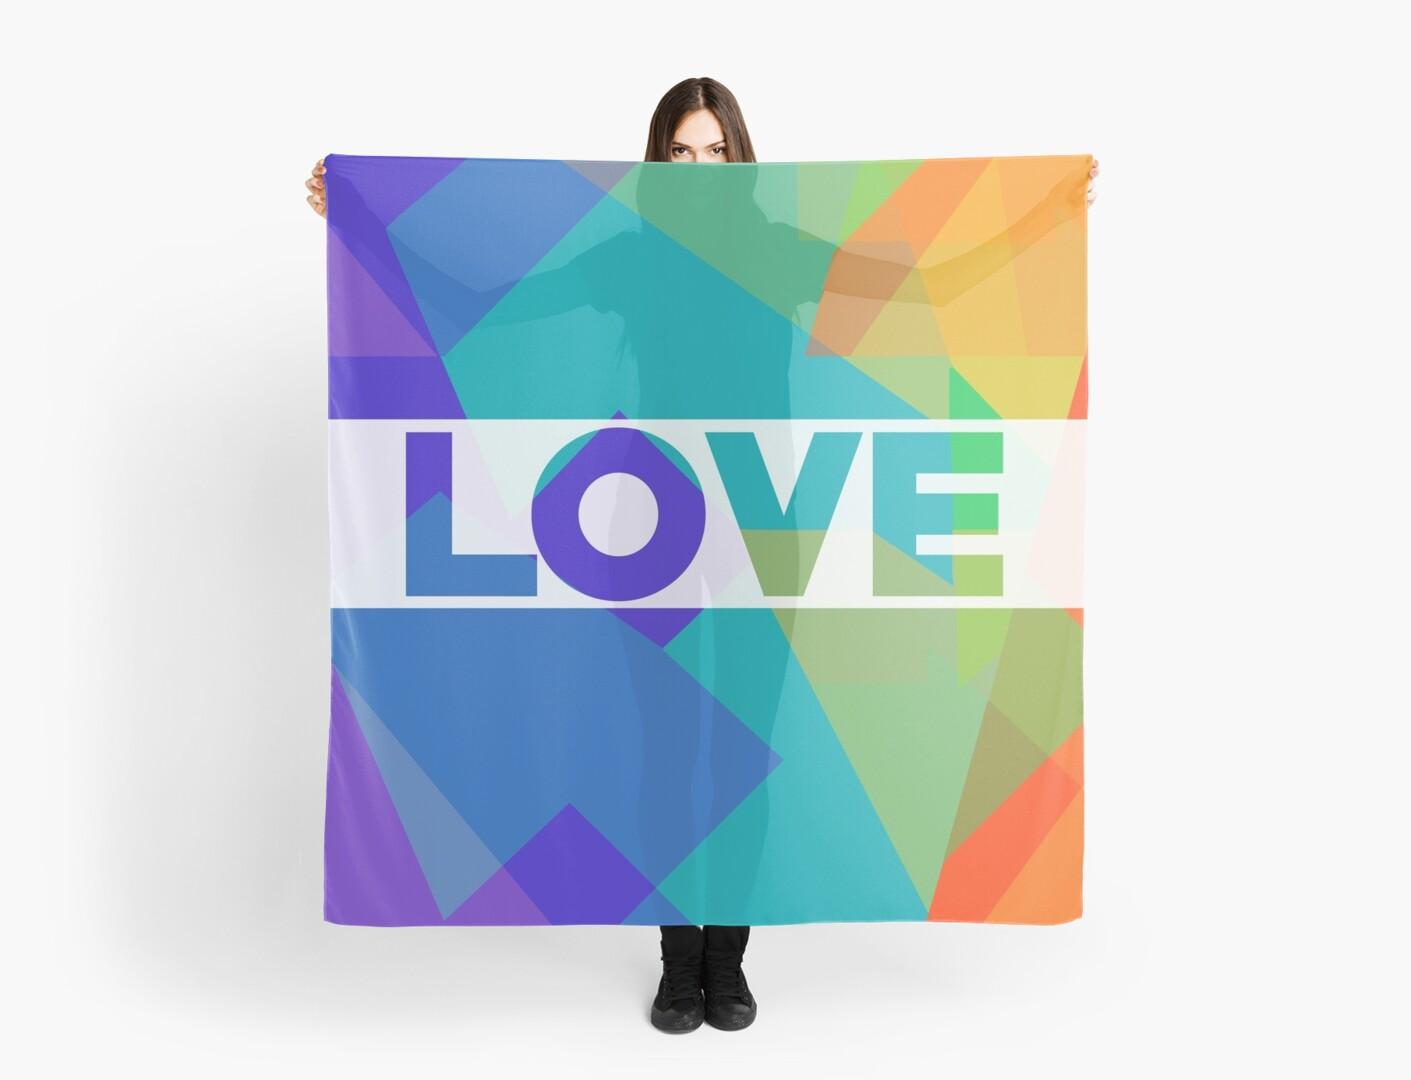 Love (LGBT) by EricRockwell